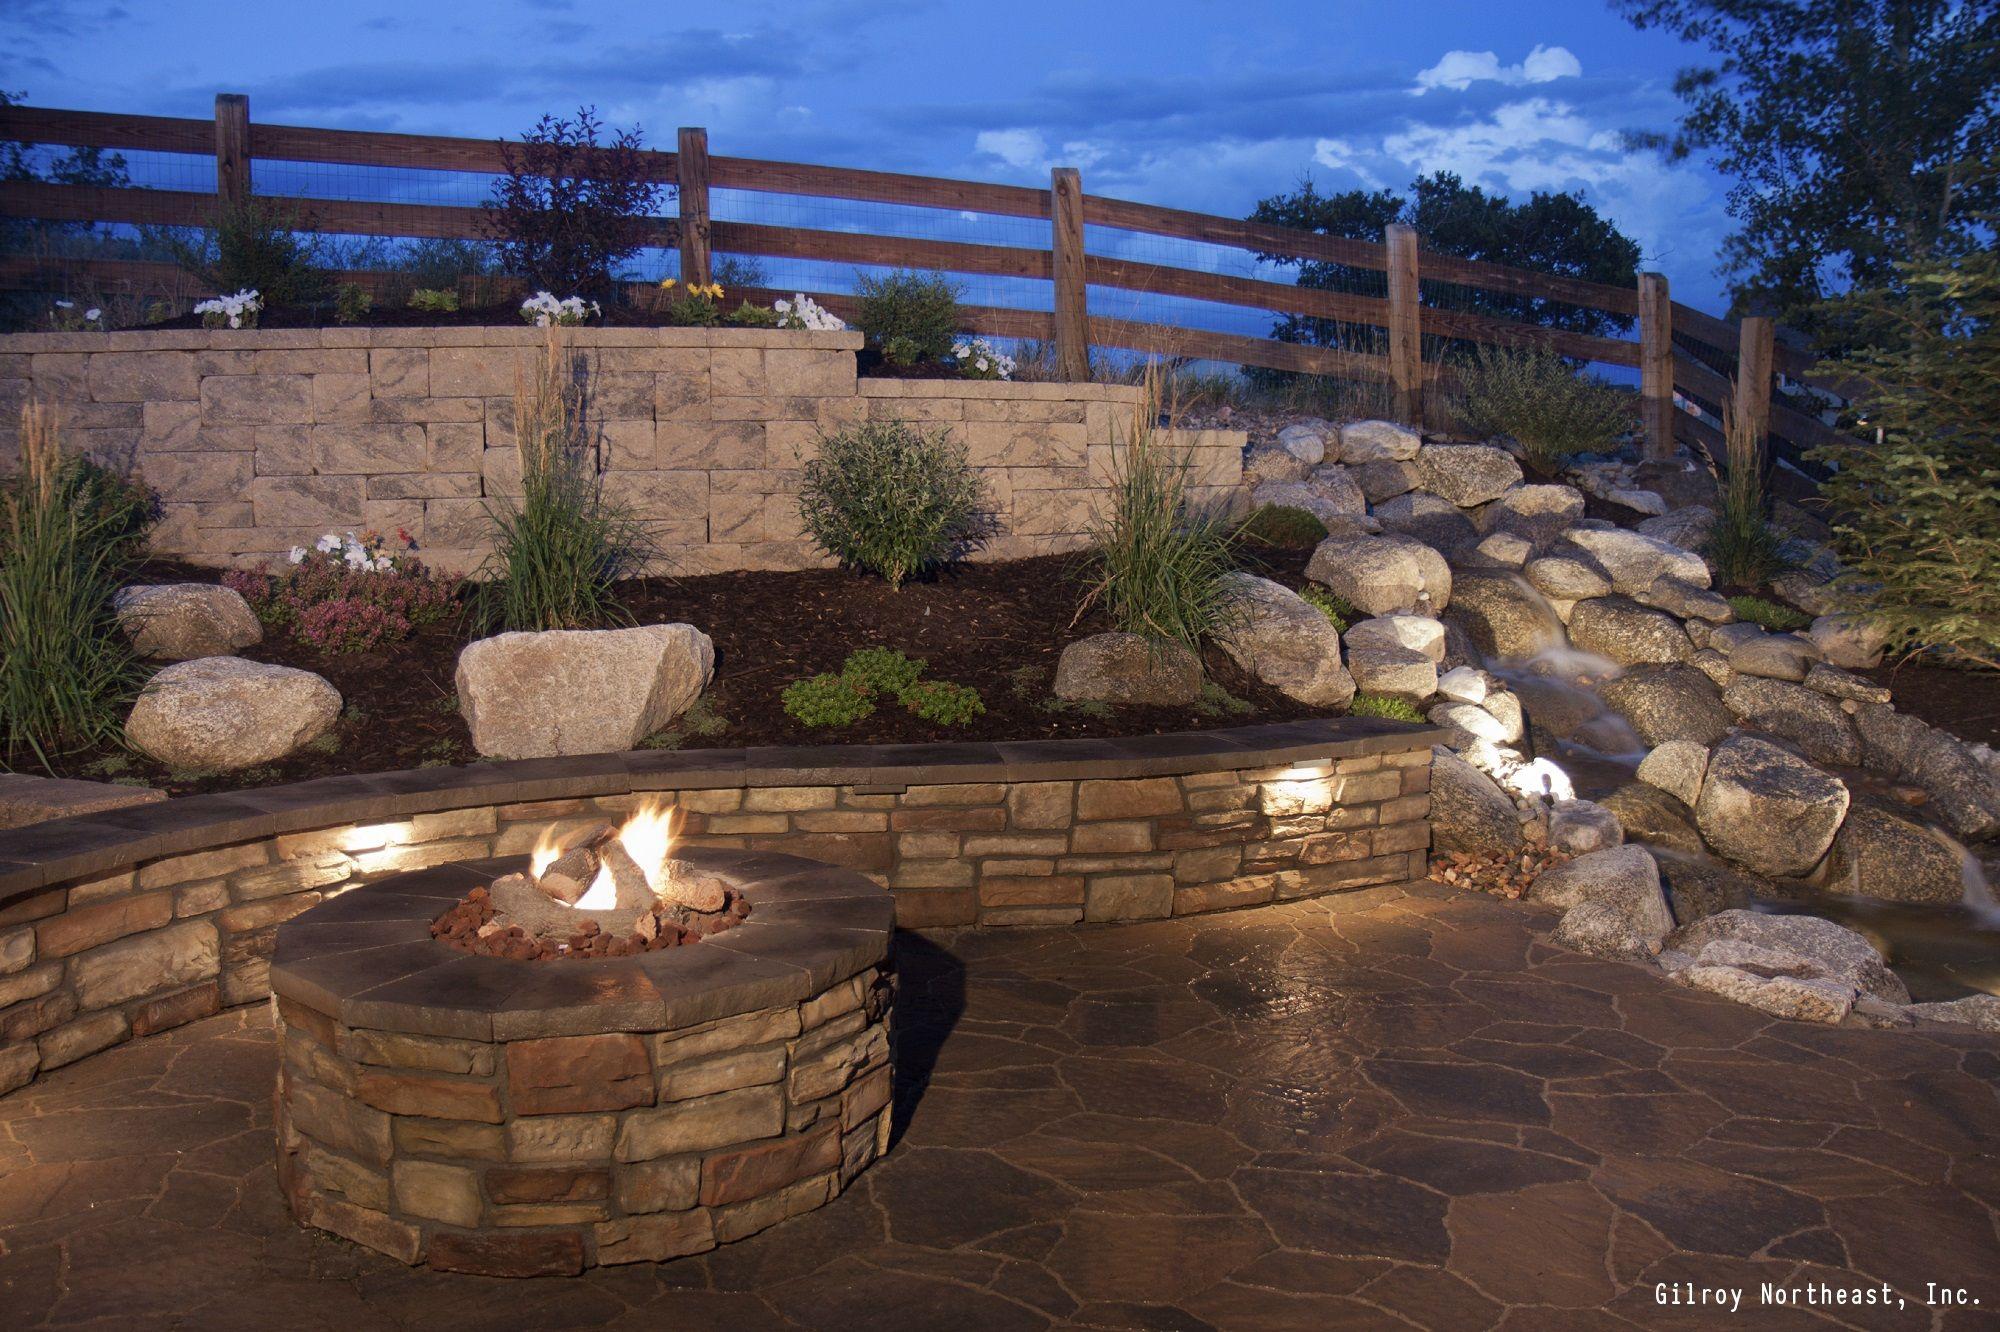 7 DIY Ways To Make Your Patio Awesome | Stone retaining ... on Patio Stone Wall Ideas  id=62798